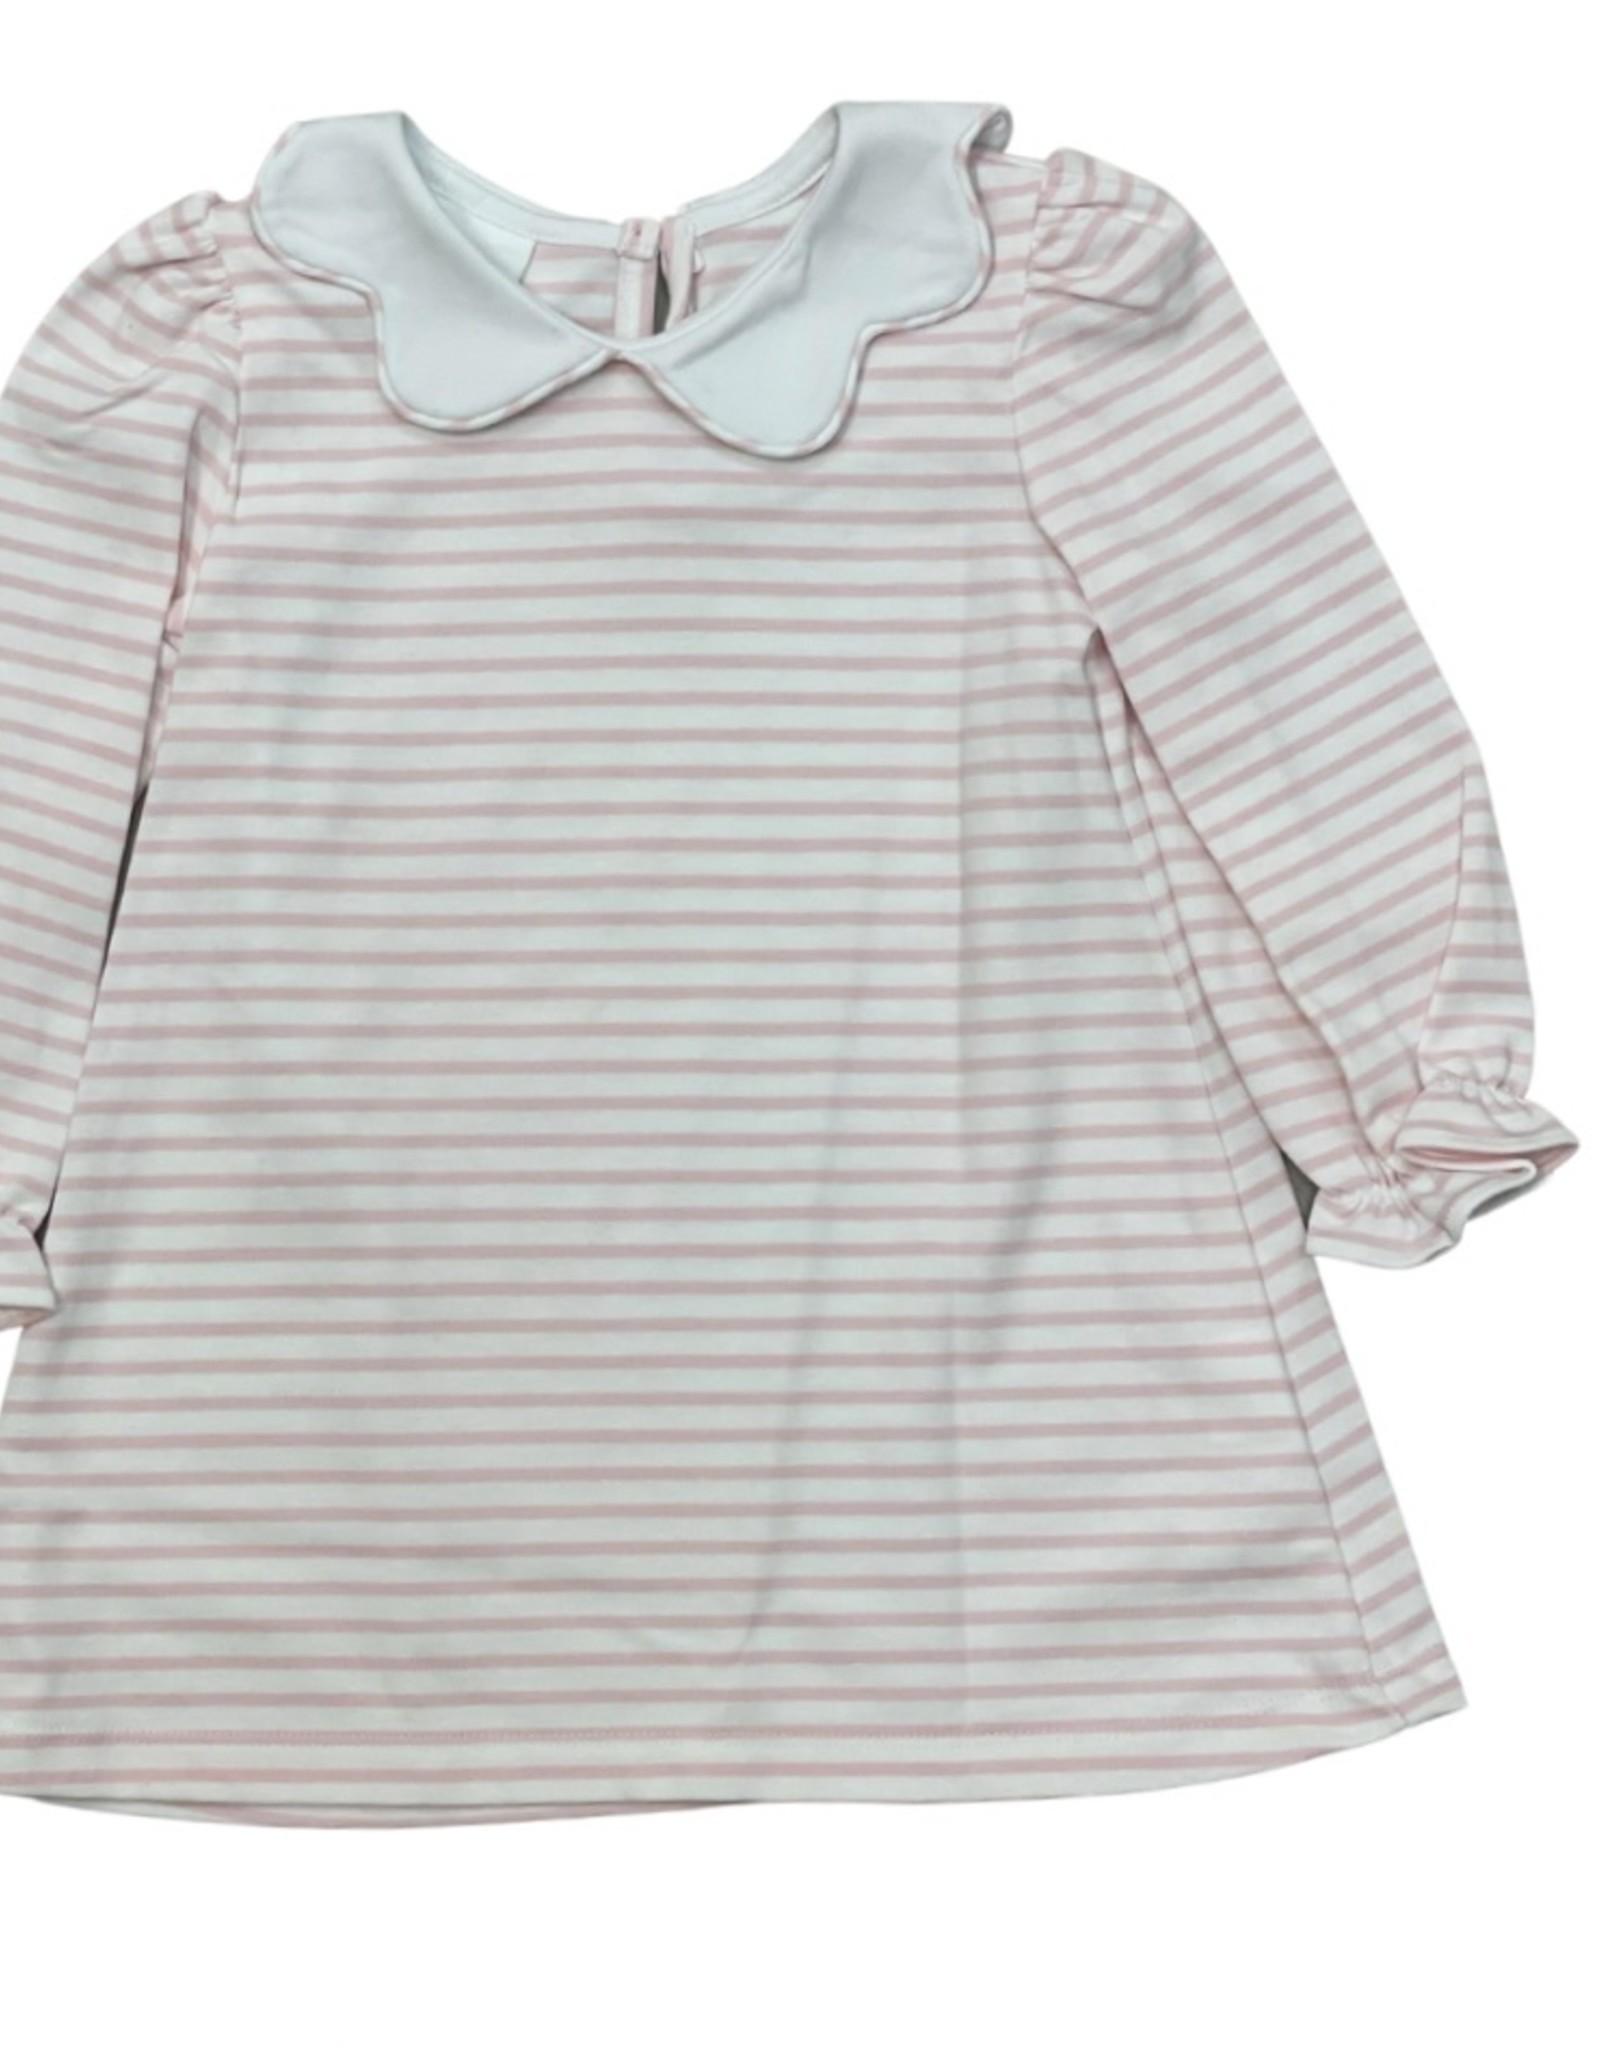 Zuccini Bryar Dress Light Pink Stripe